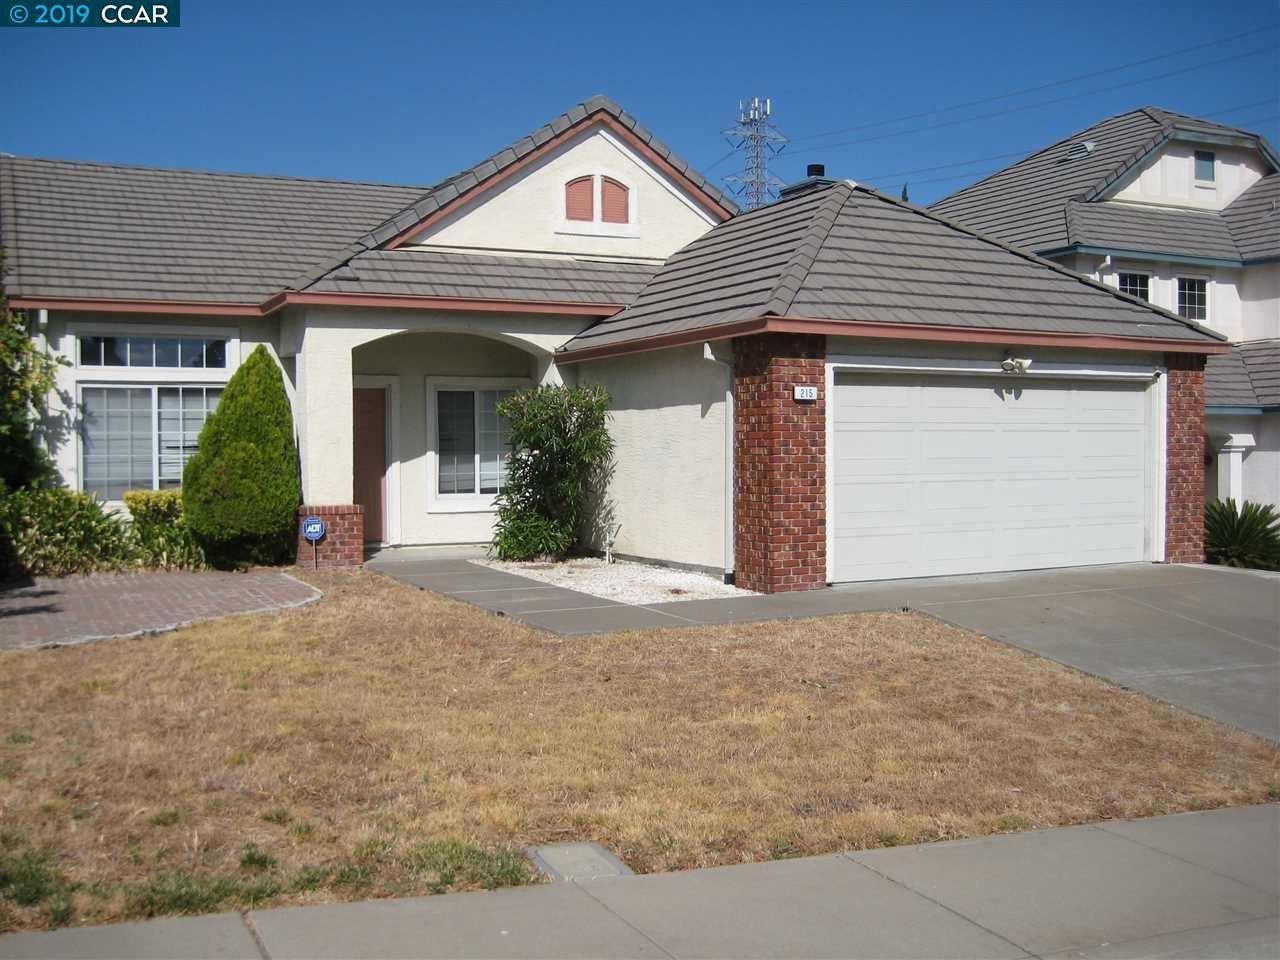 215 Shadow Hill Cir, Pittsburg, CA 94565 - #: 40884143